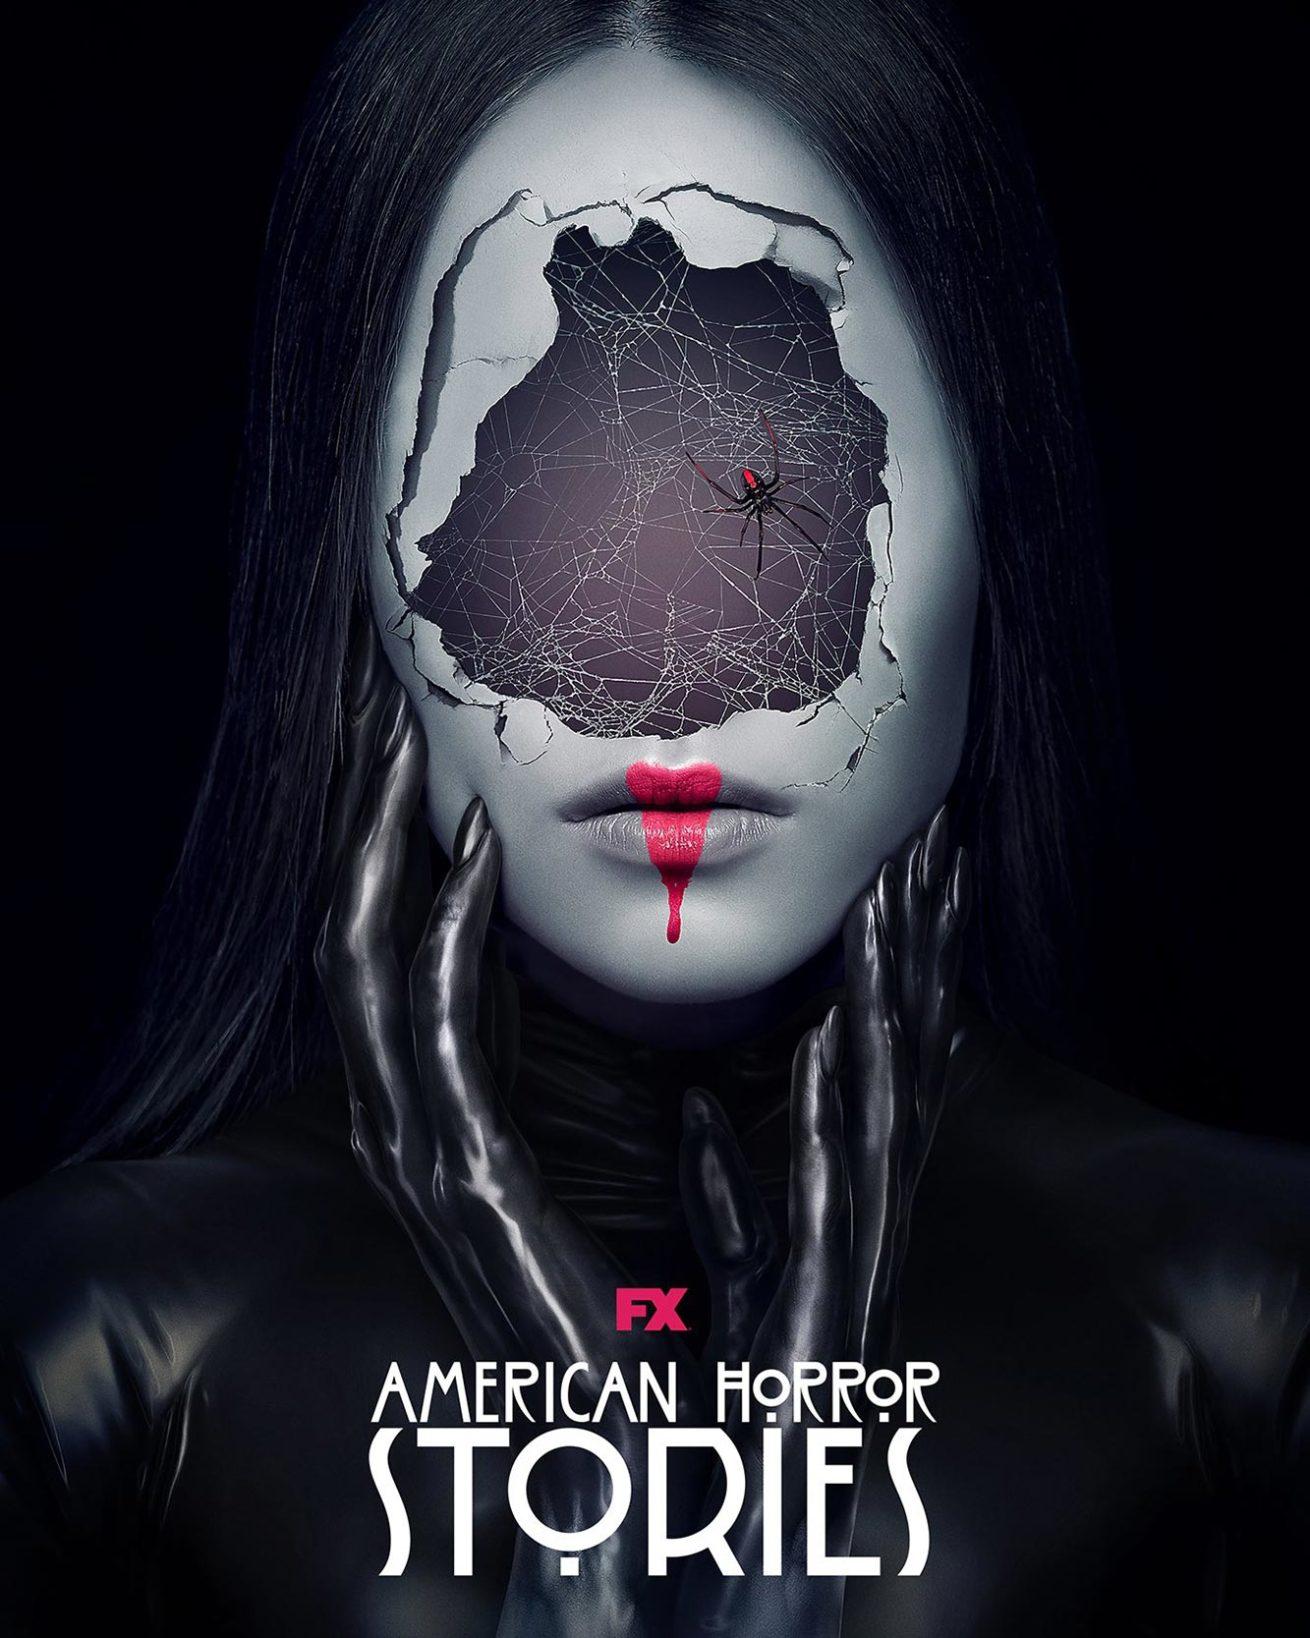 american horror story spin-off'u american horror stories'e ilk bakış